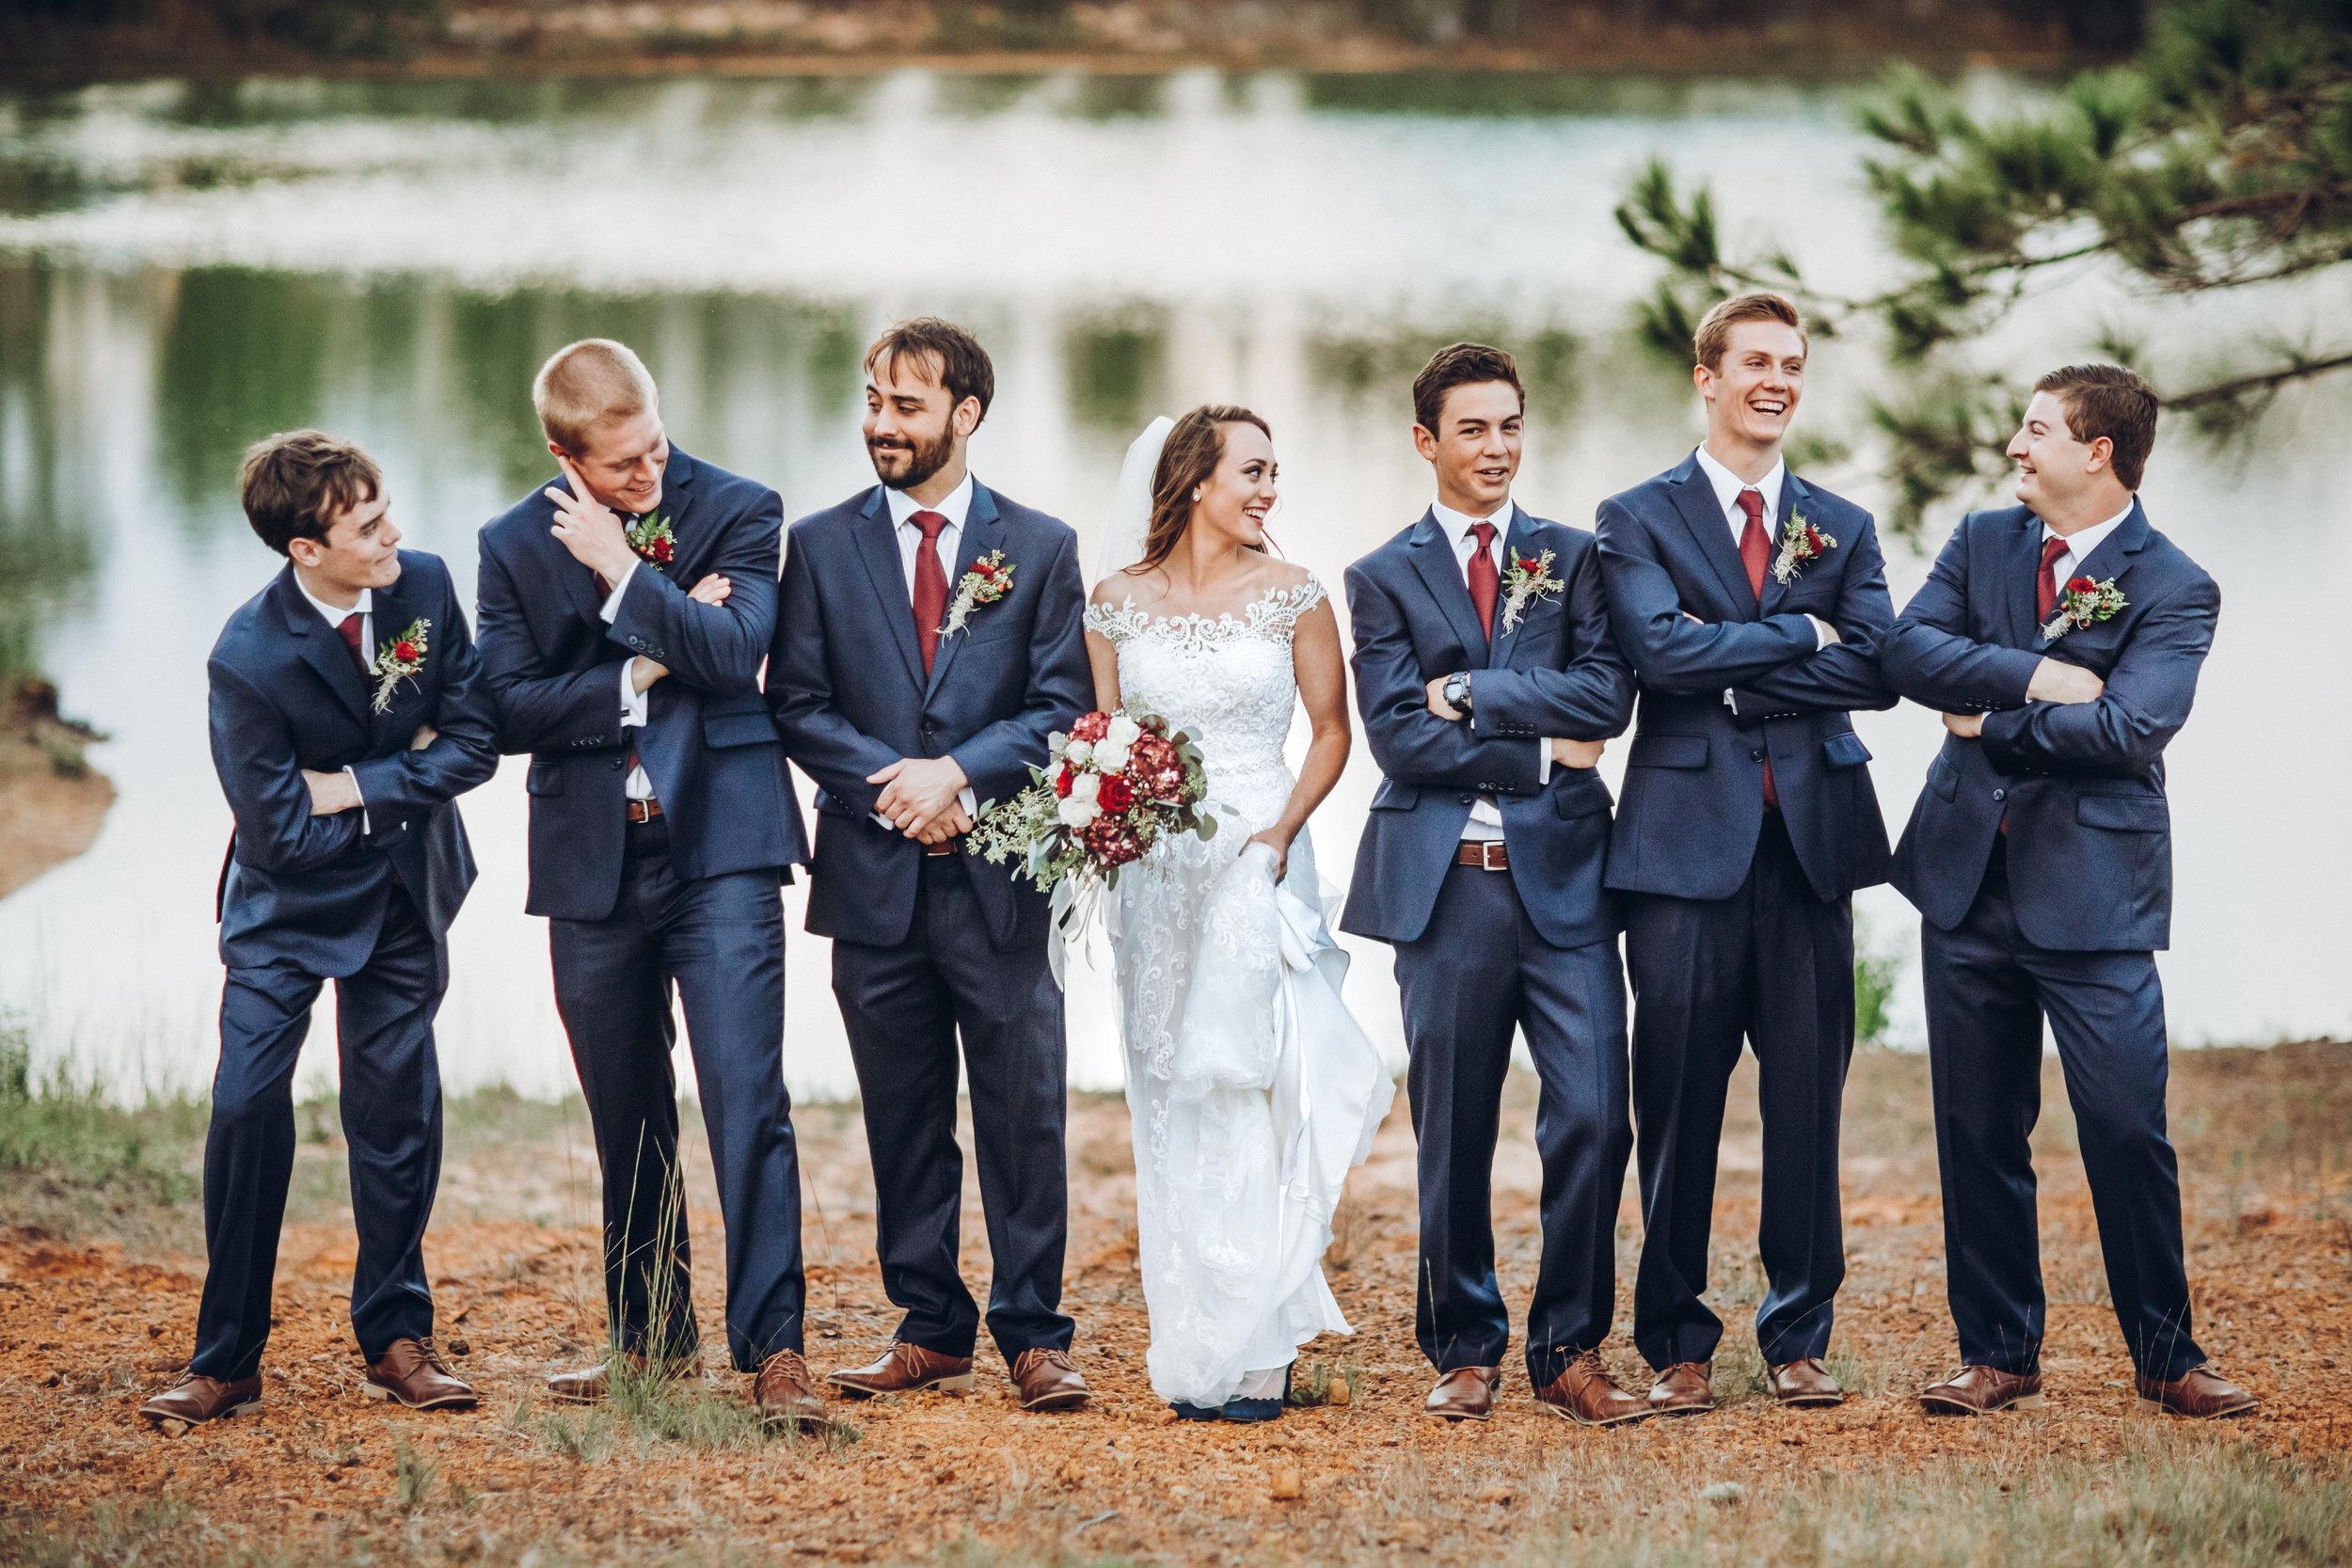 6. Bridal Party - Romantic Backyard Farm Wedding - Lauren+Daniel 033.jpg